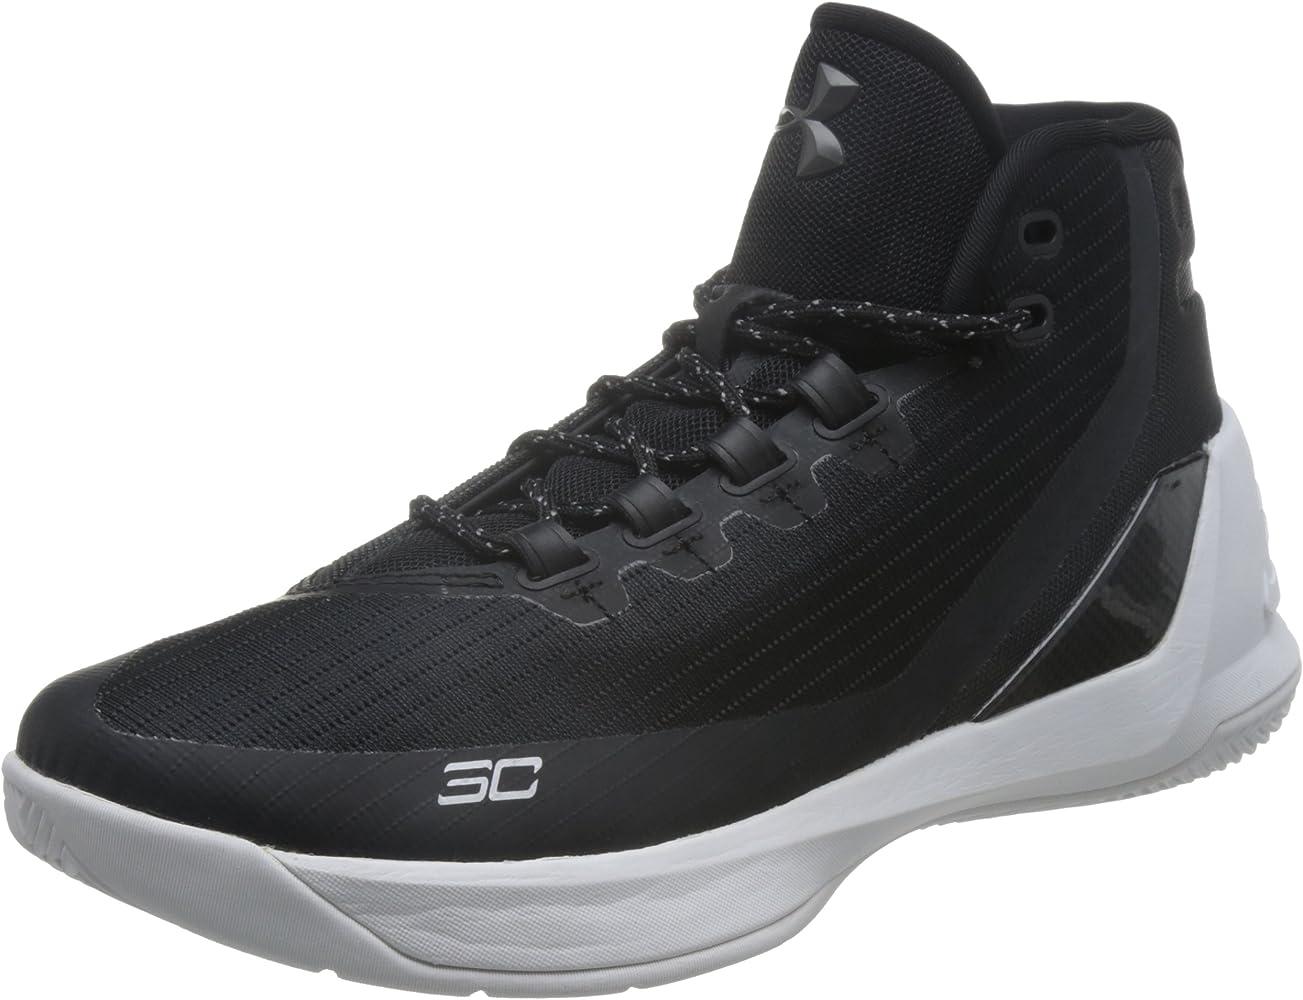 Under ArmourCURRY 3 - Zapatillas de Baloncesto - Black/Taxi ...